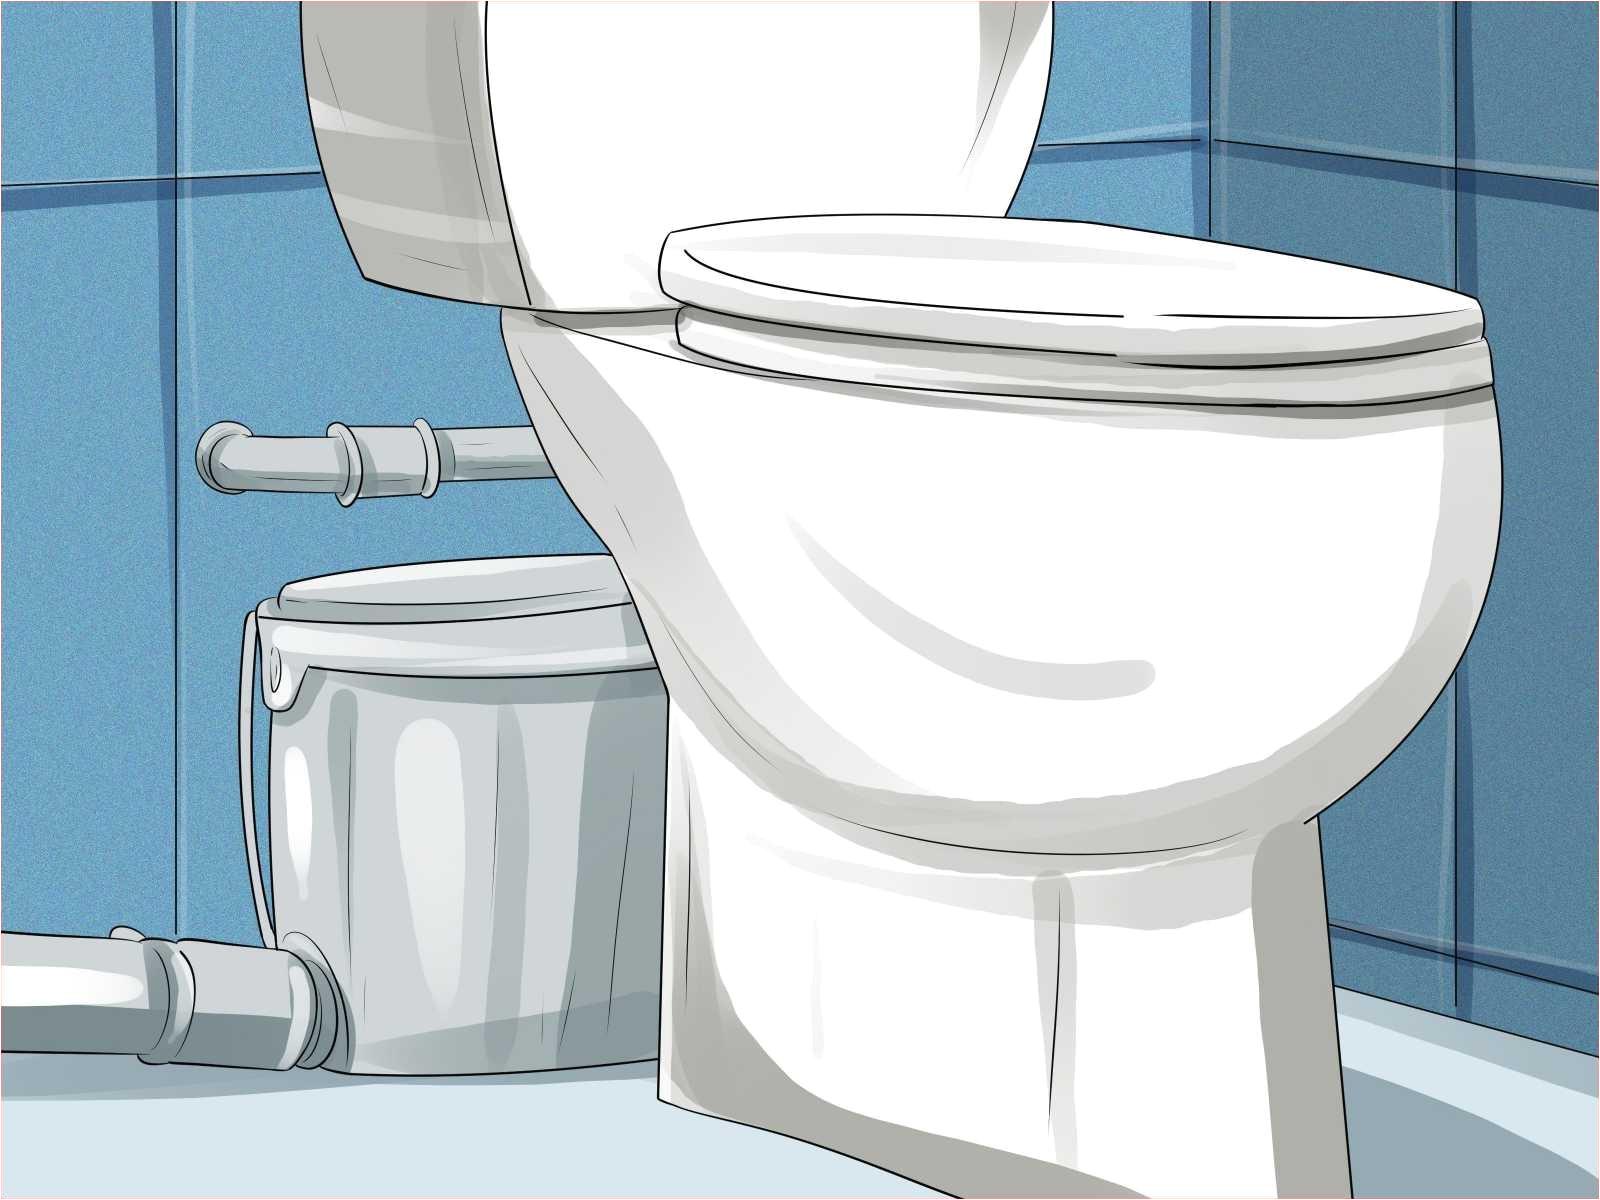 refinishing a bathtub inspirational bathtub reglazing nj inspirational shower drain plumbing elegant 0d